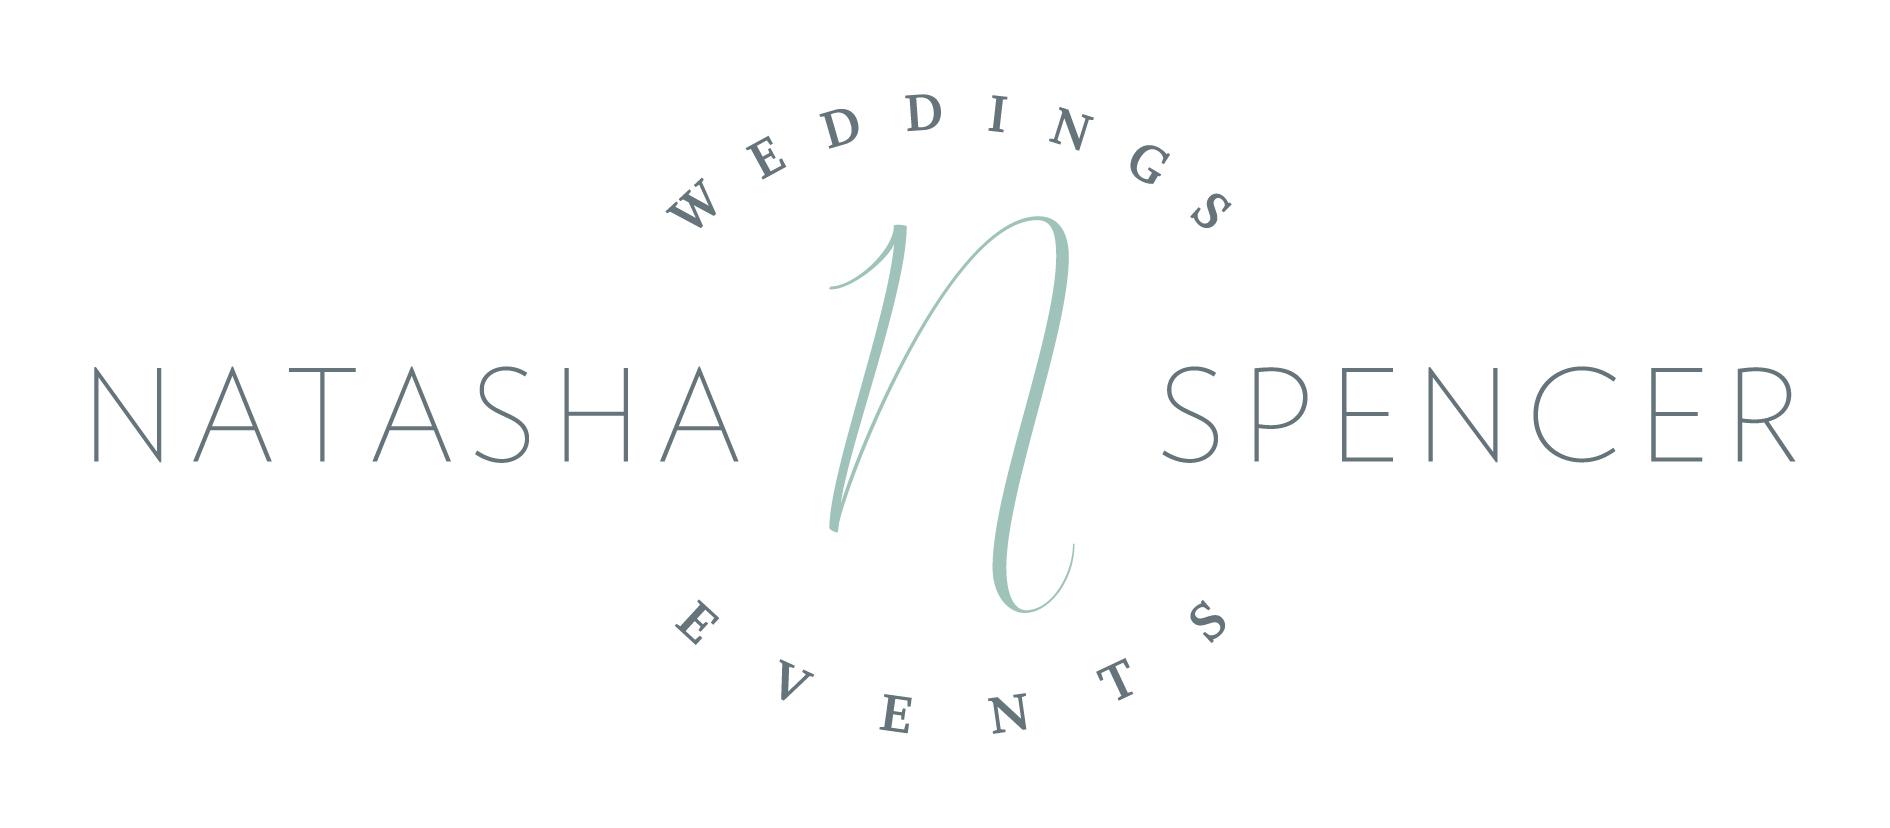 Natasha Spencer Weddings & Events primary logo.jpg